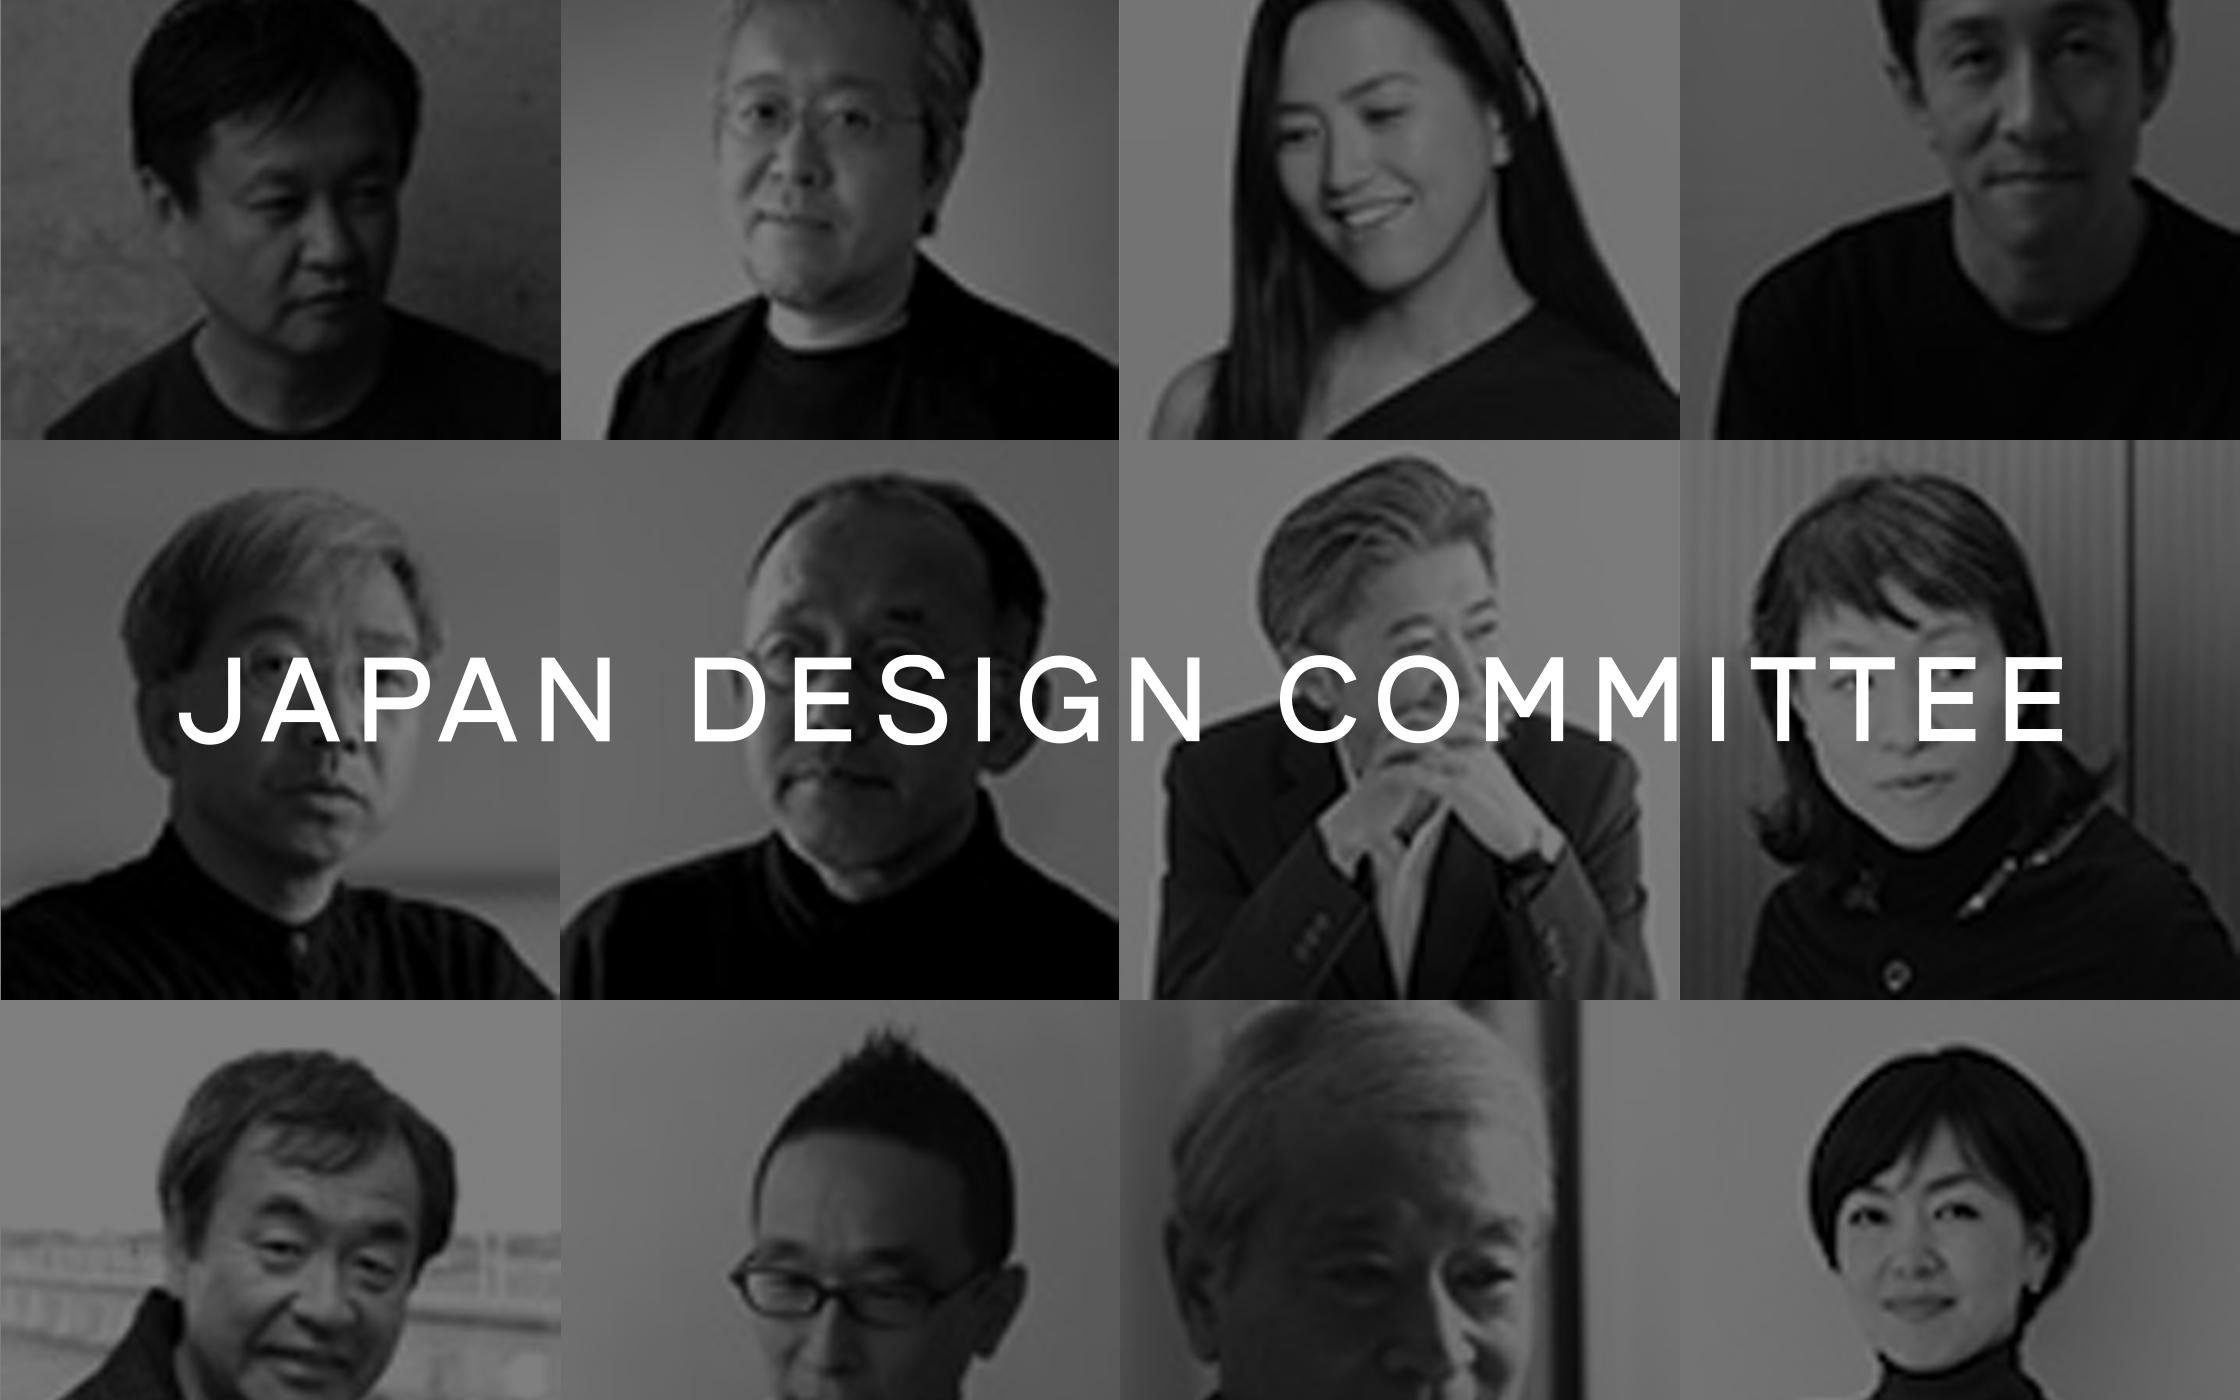 JAPAN DESIGN COMMITTEE